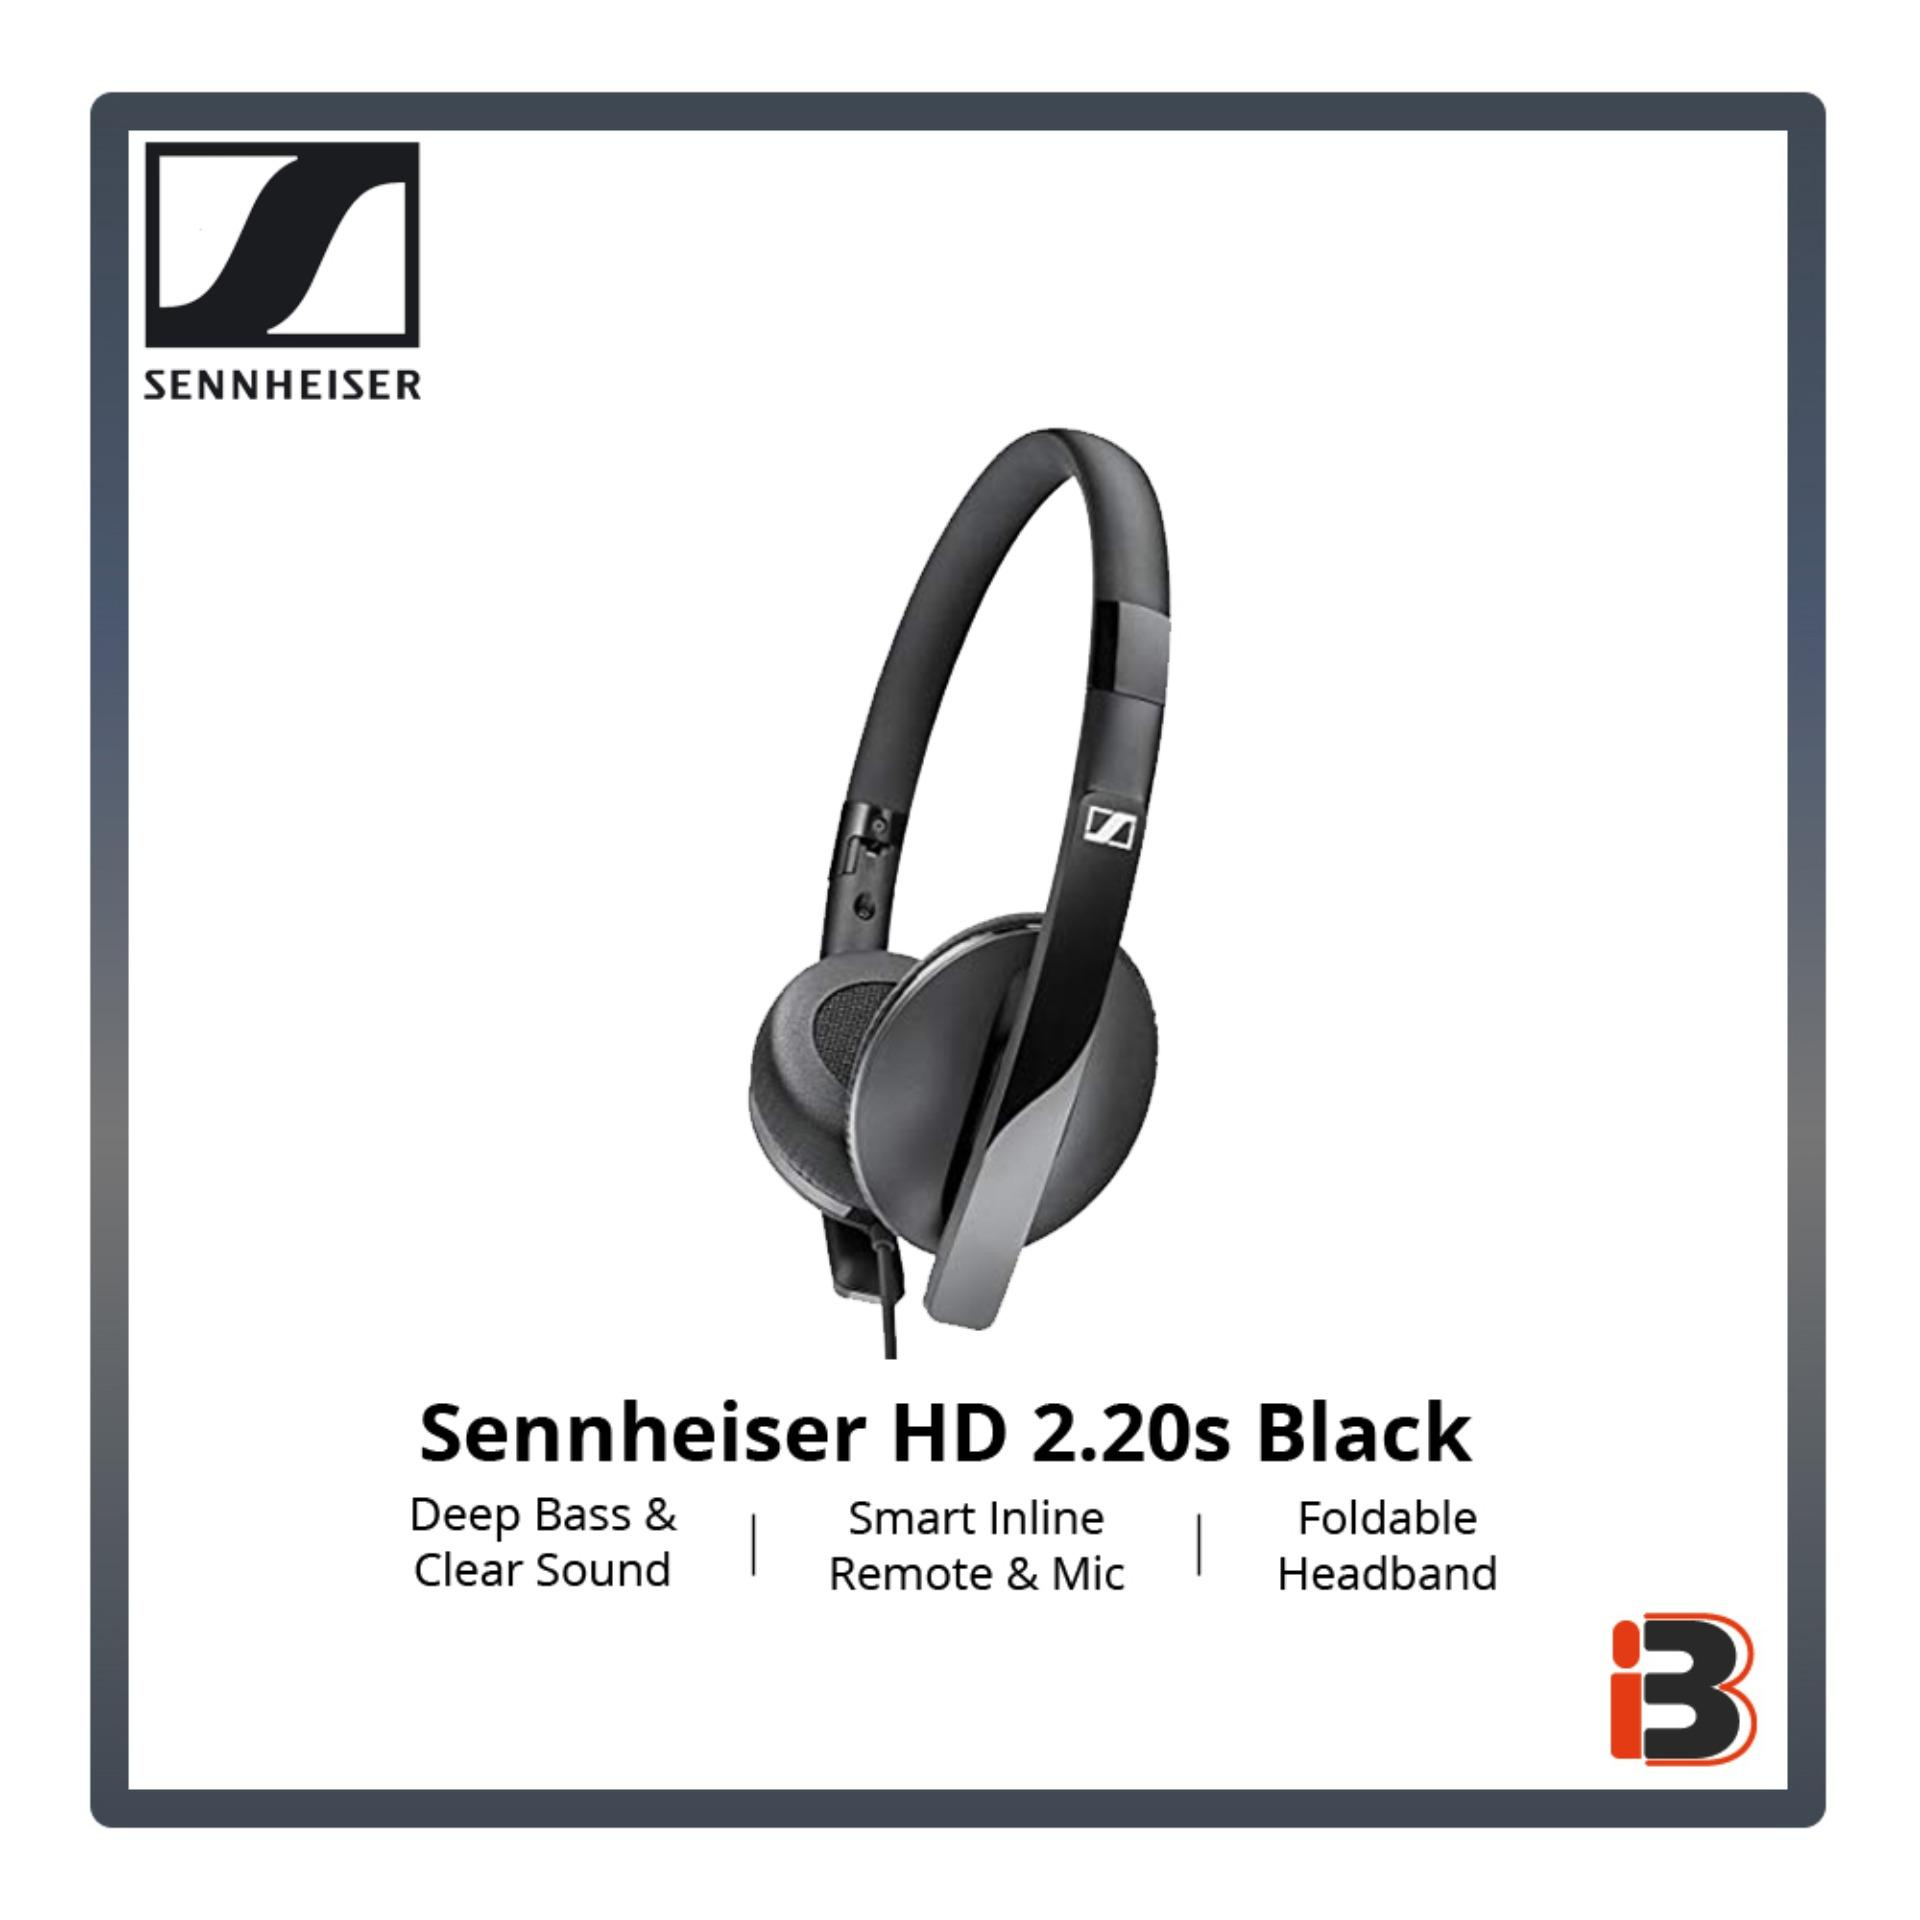 7de87313ab6 Sennheiser Headphones Philippines - Sennheiser Audio Headphones for ...